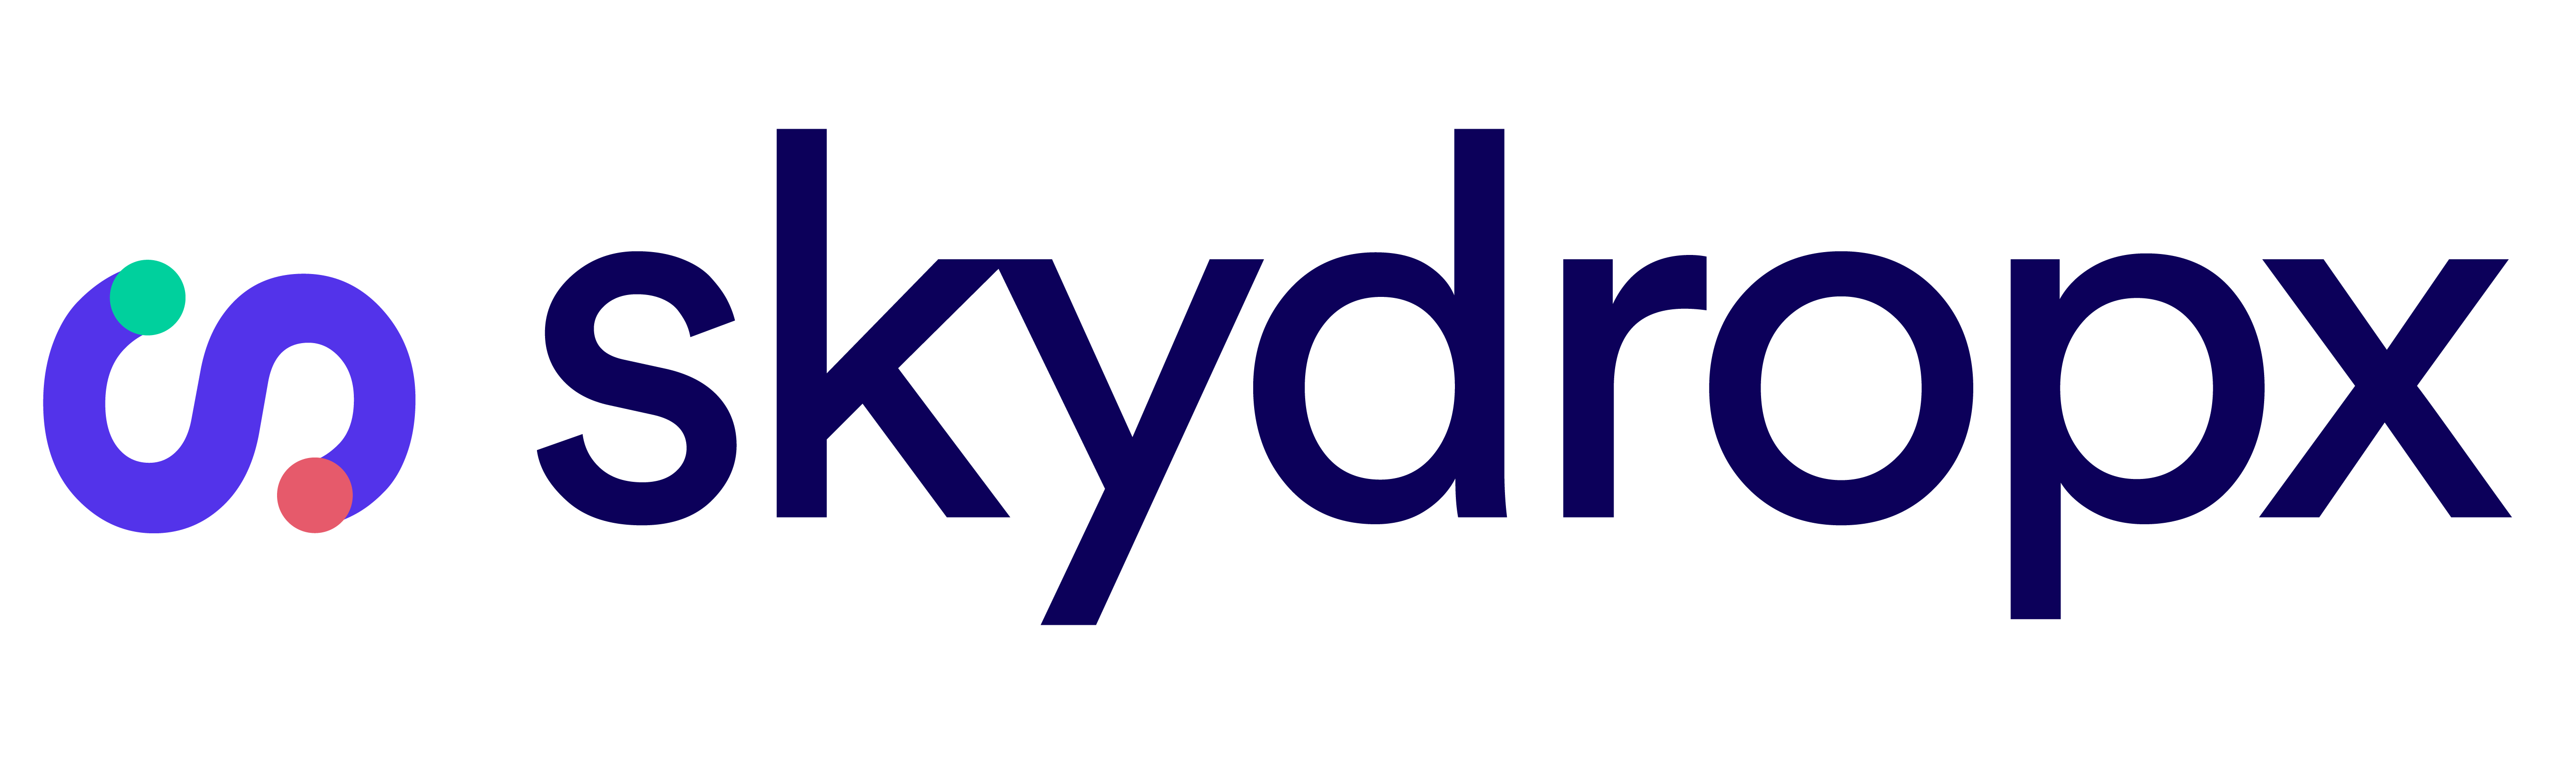 skydropx_logo